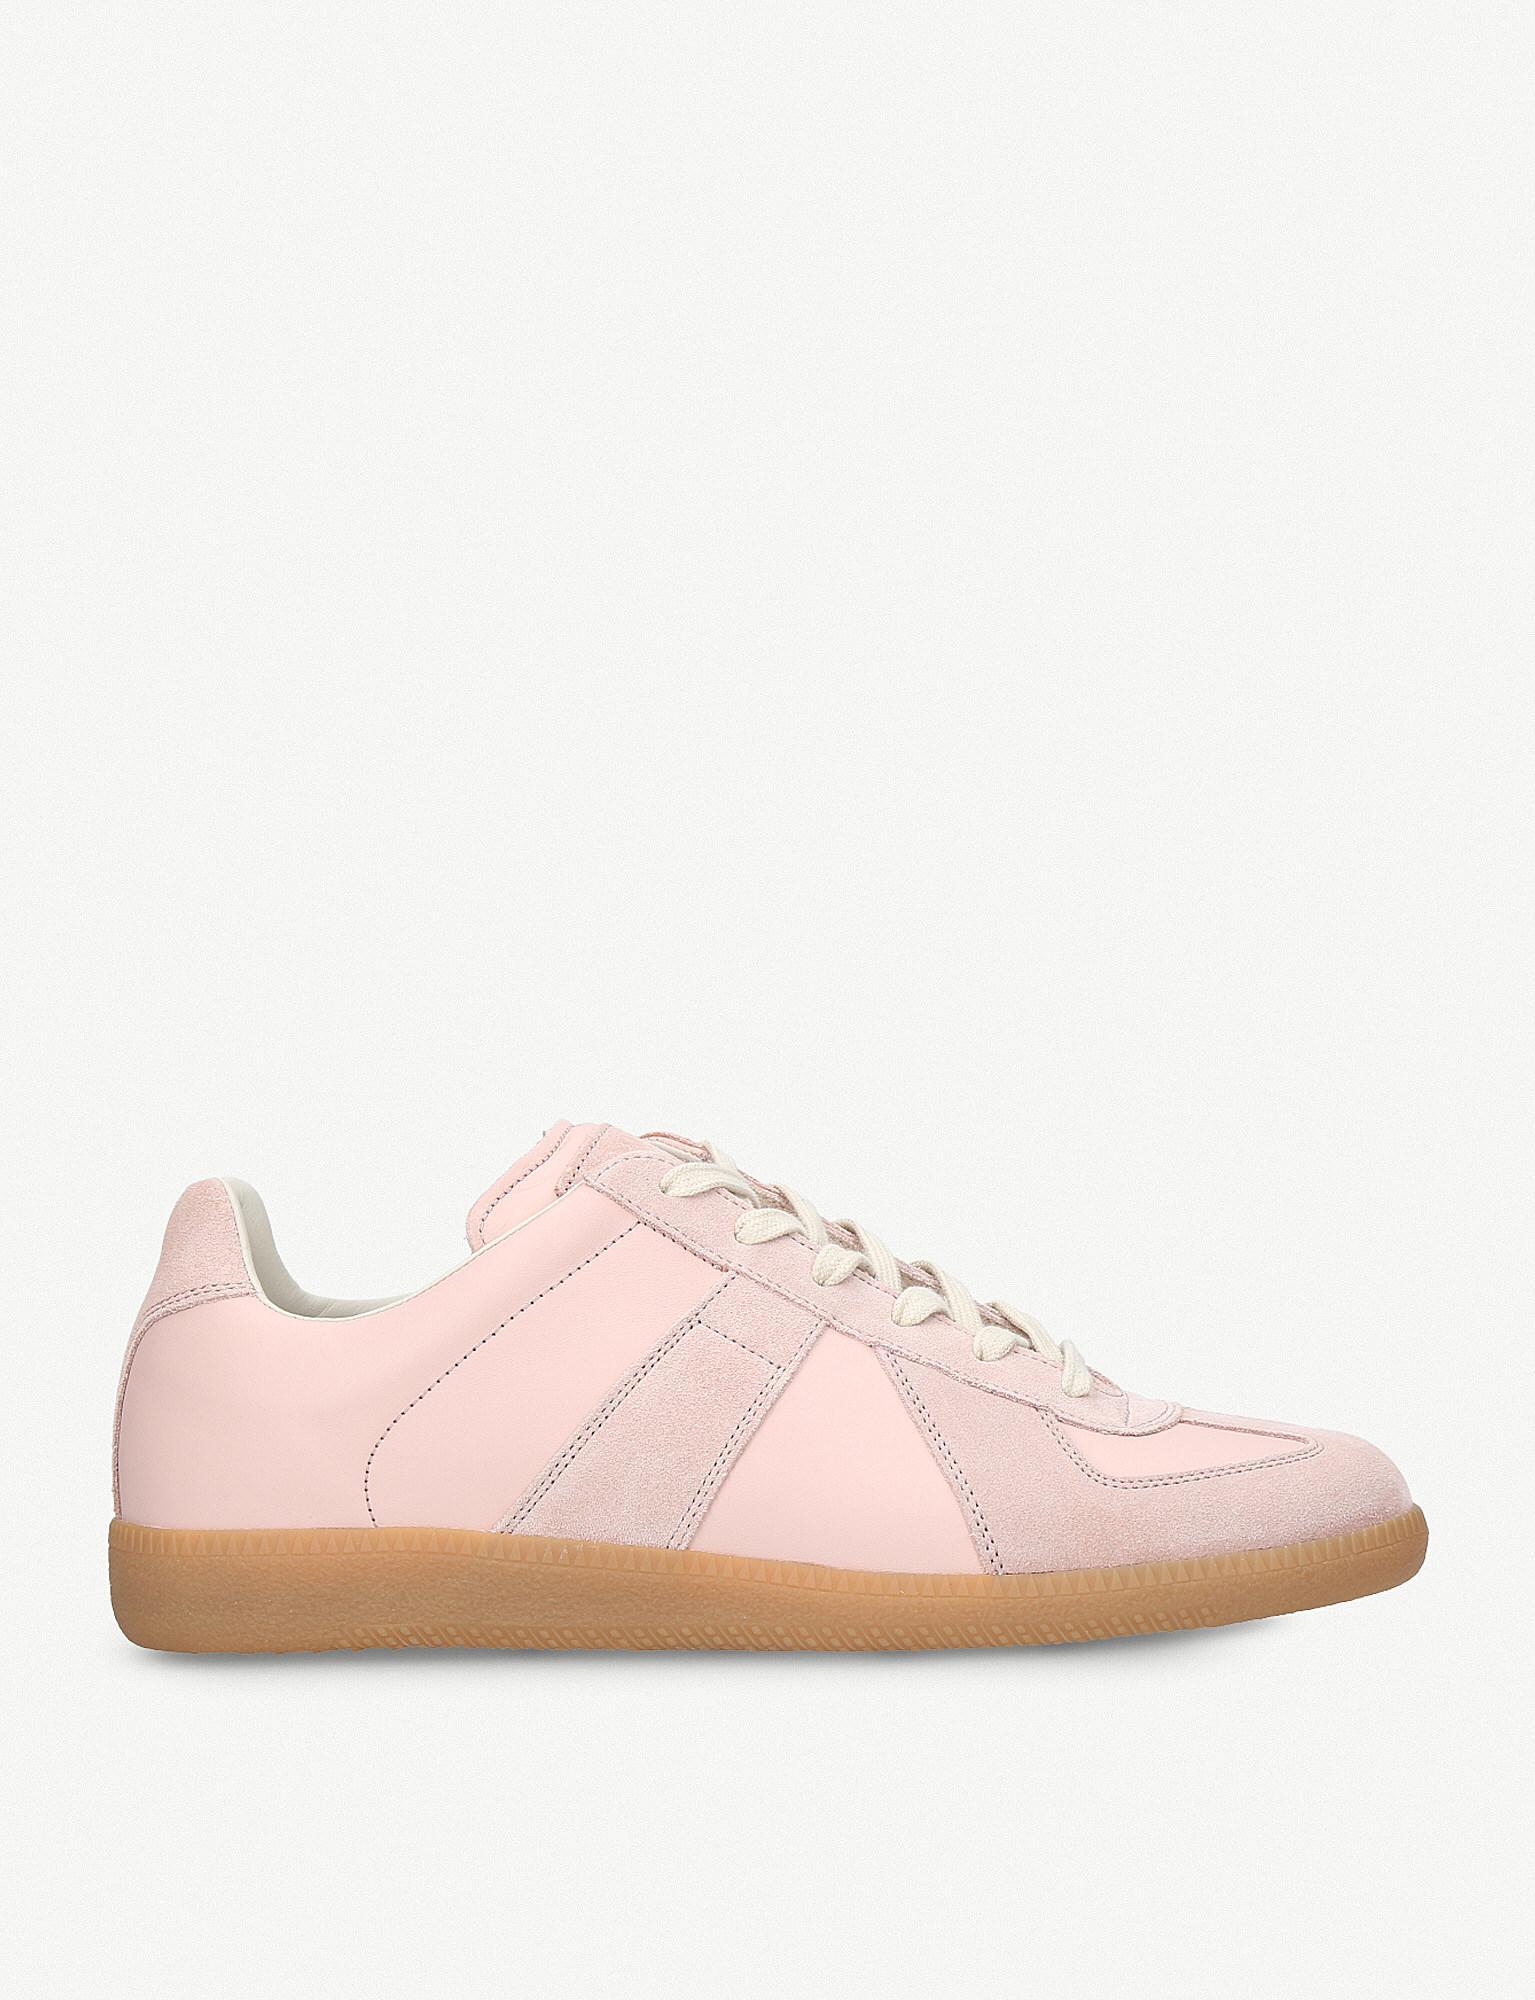 Pink Replica Sneakers Maison Martin Margiela ahFO0pYRuC